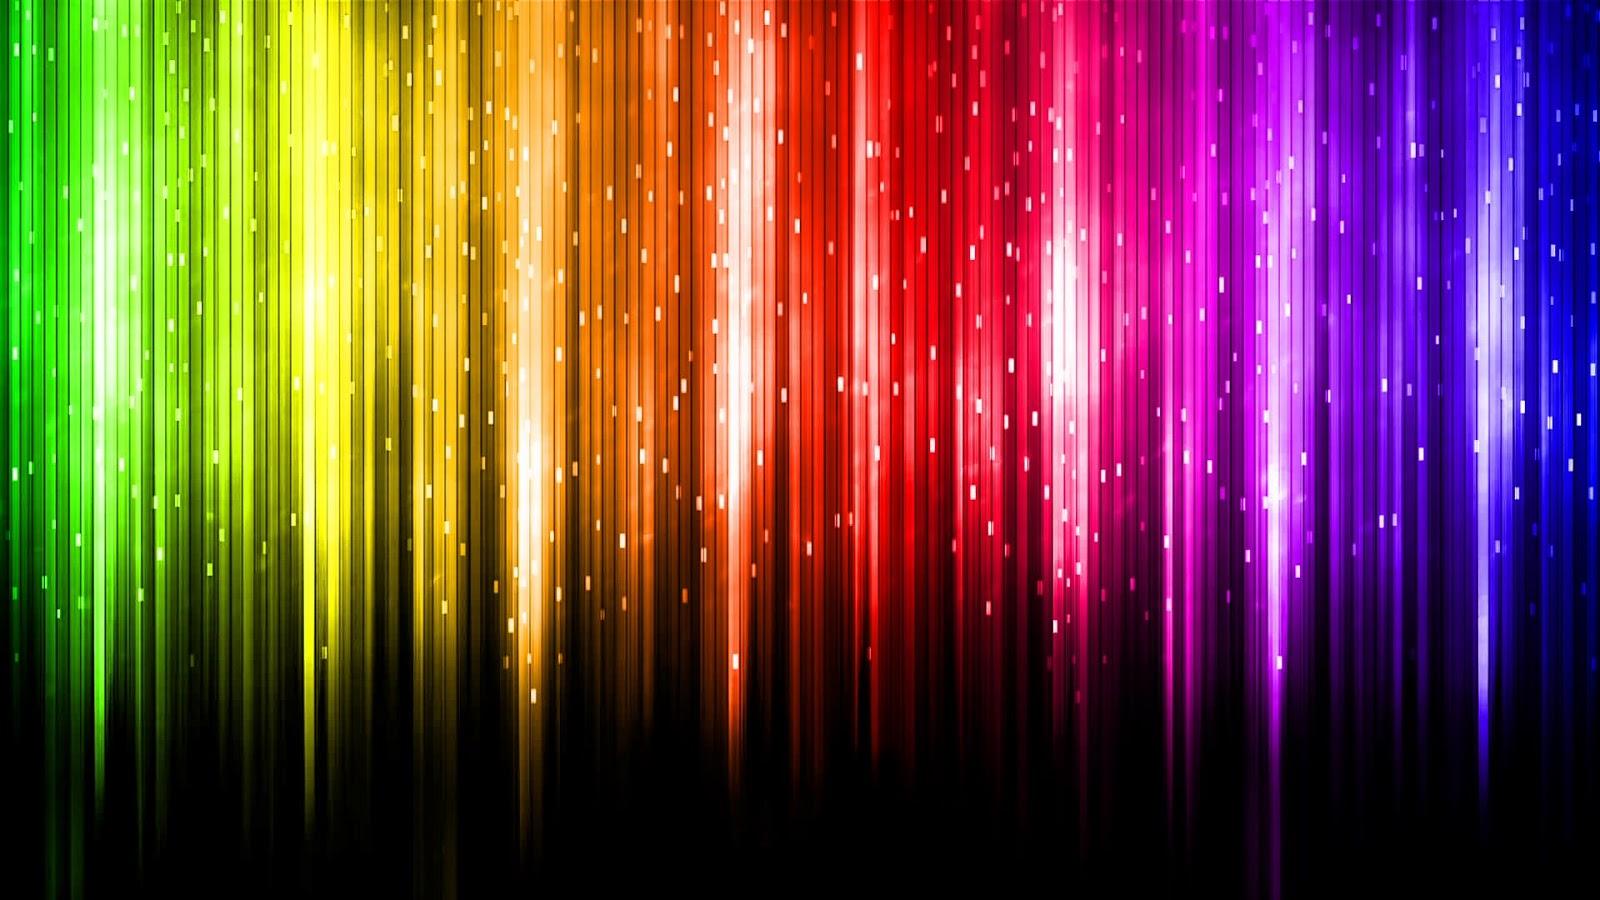 Rainbow Wallpapers HD:wallpapers screensavers